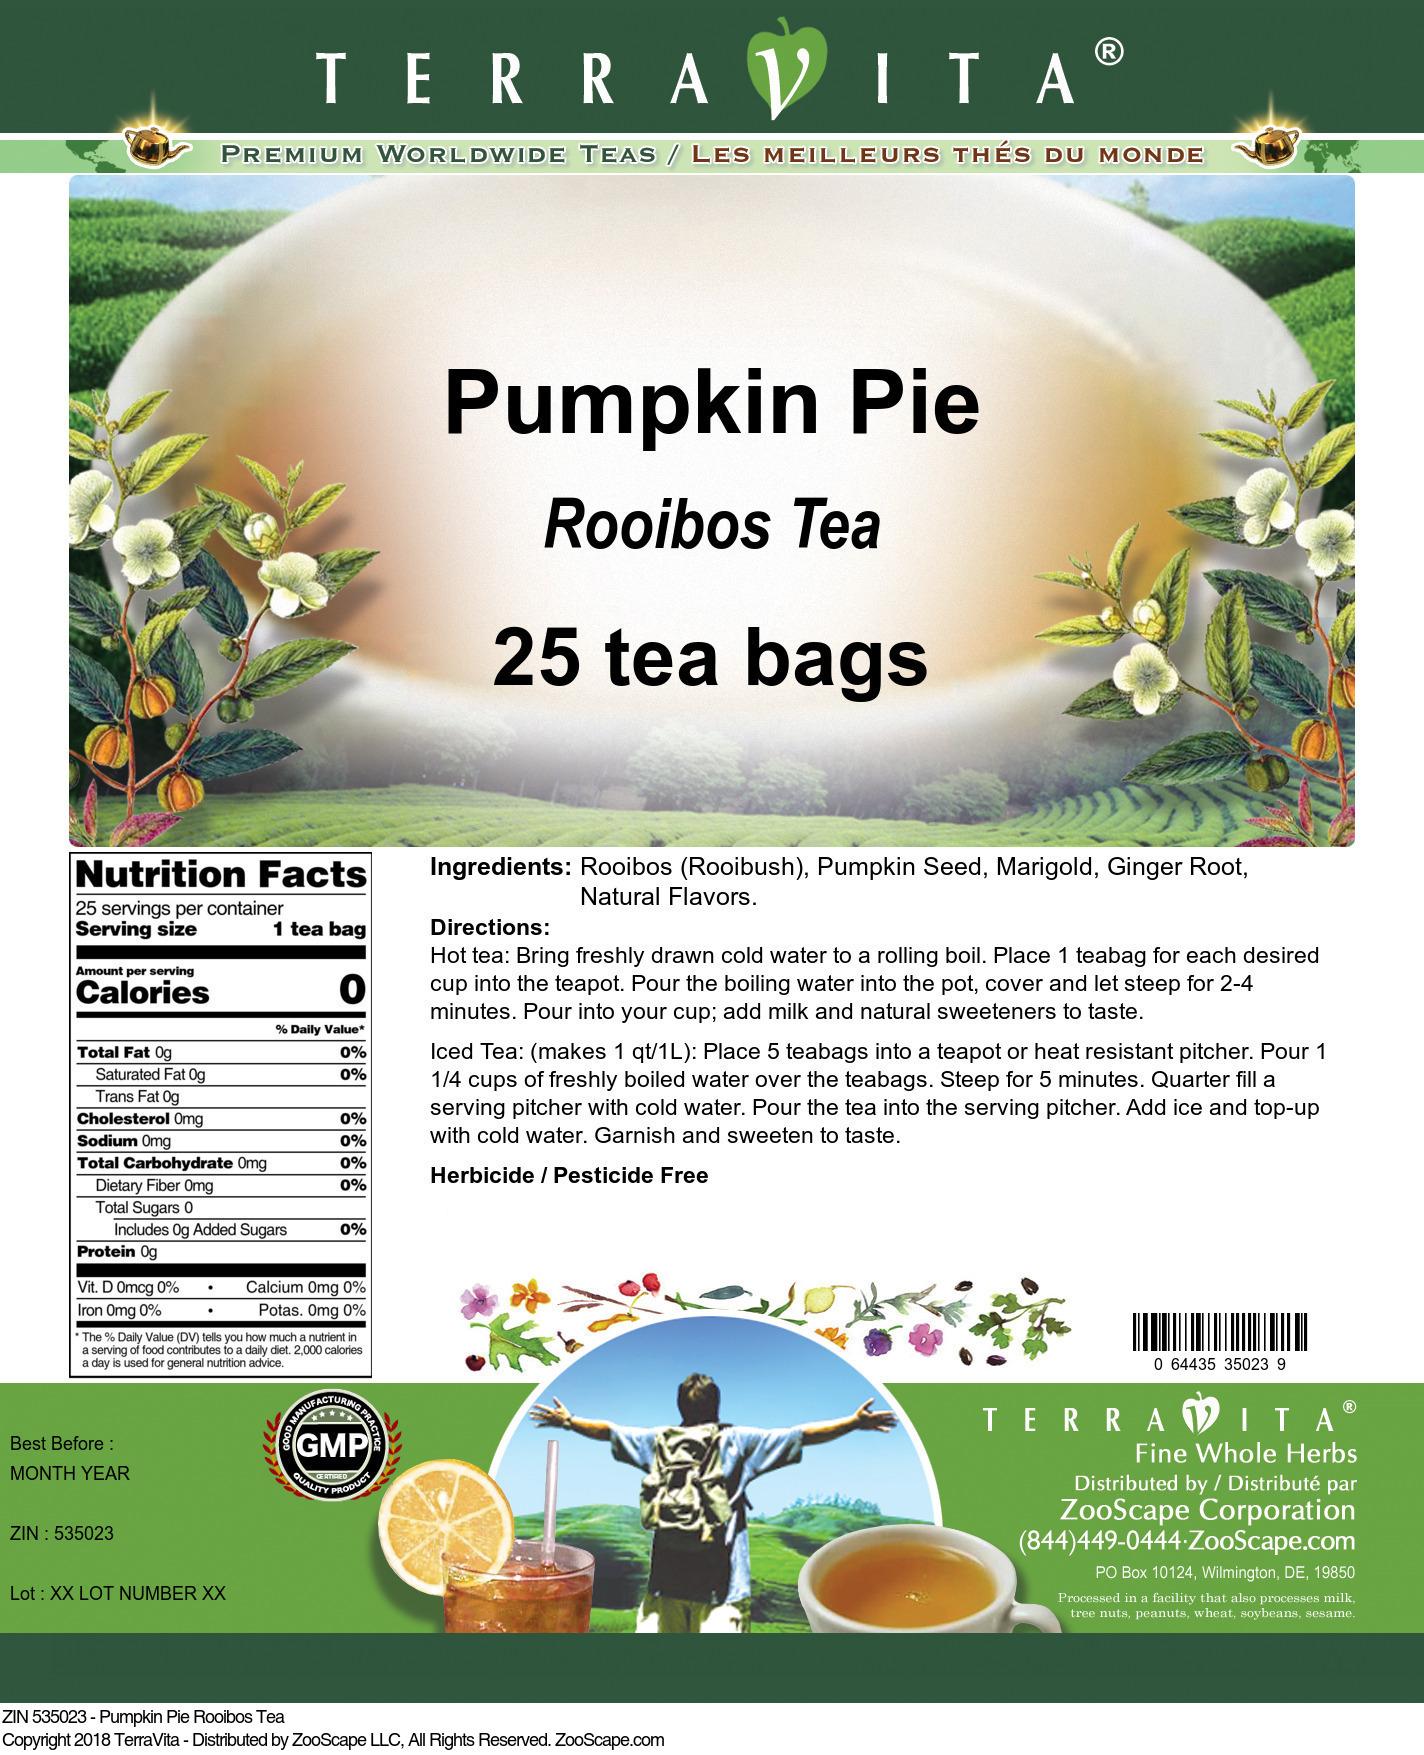 Pumpkin Pie Rooibos Tea